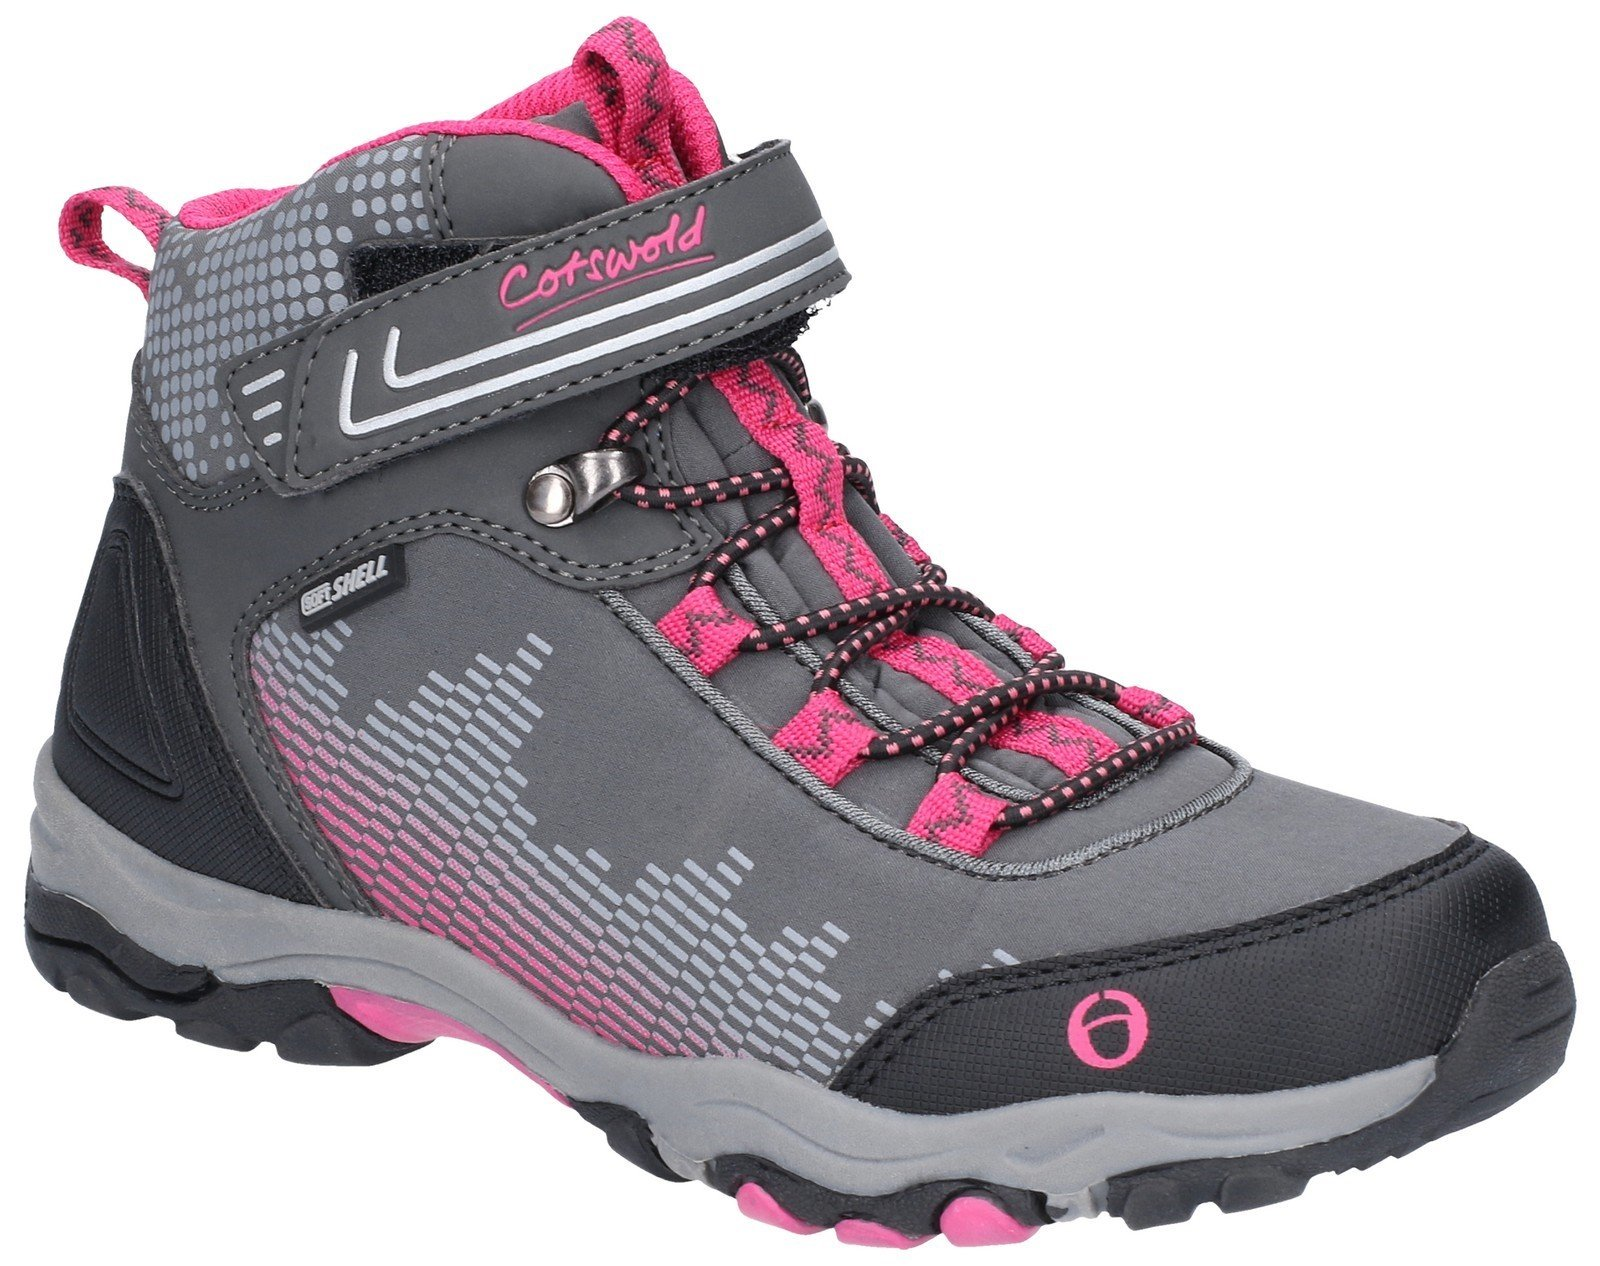 Cotswold Kids Ducklington Hiking Waterproof Boot Multicolor 28252 - Grey/Pink 5